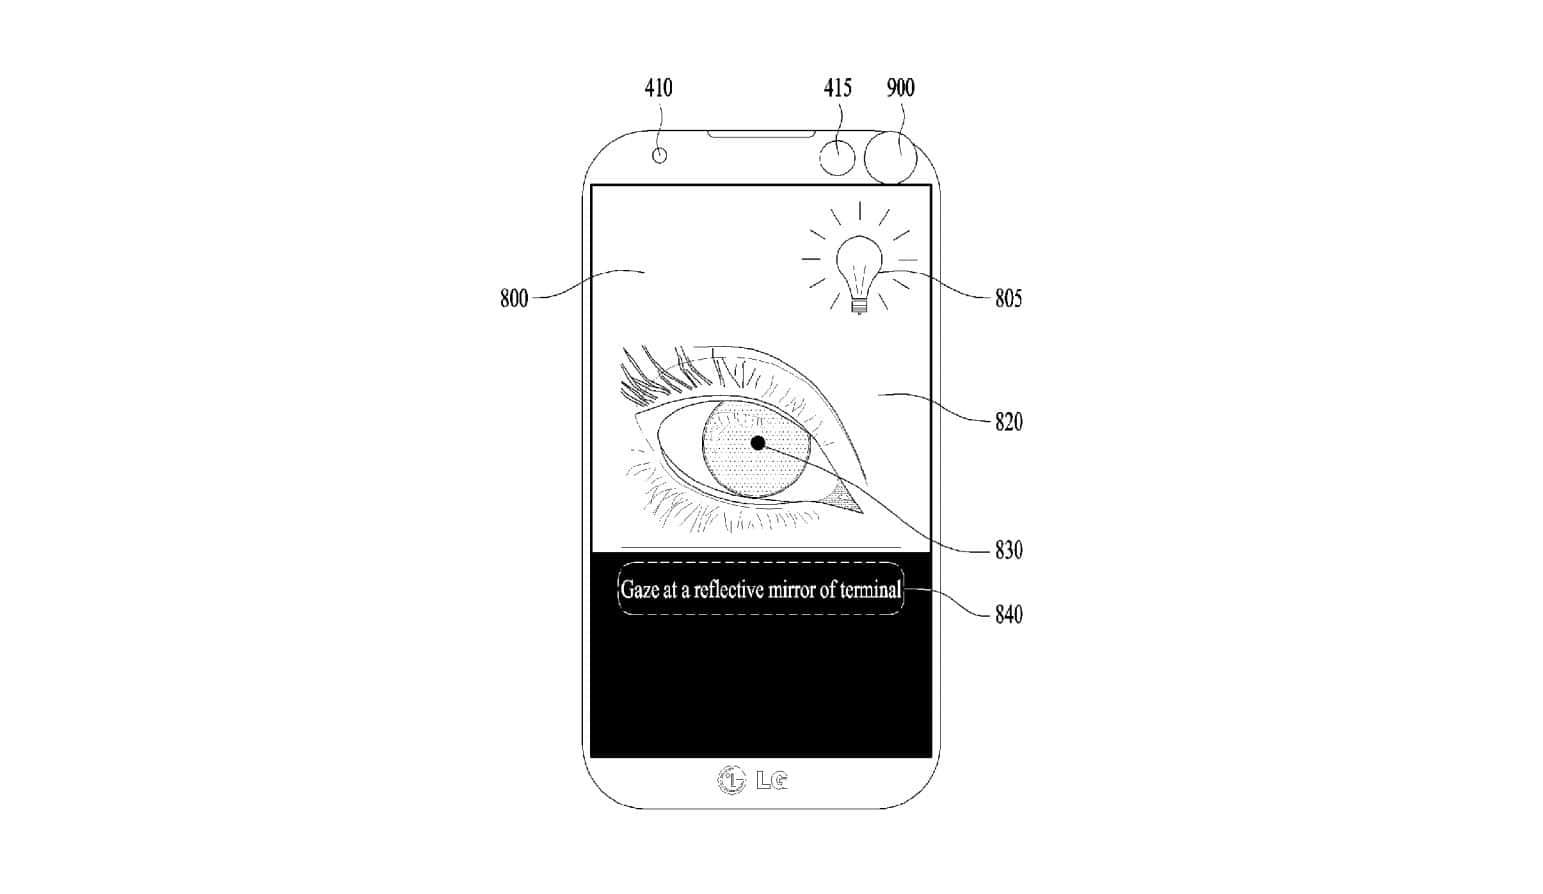 LG Iris WIPO Patent 8